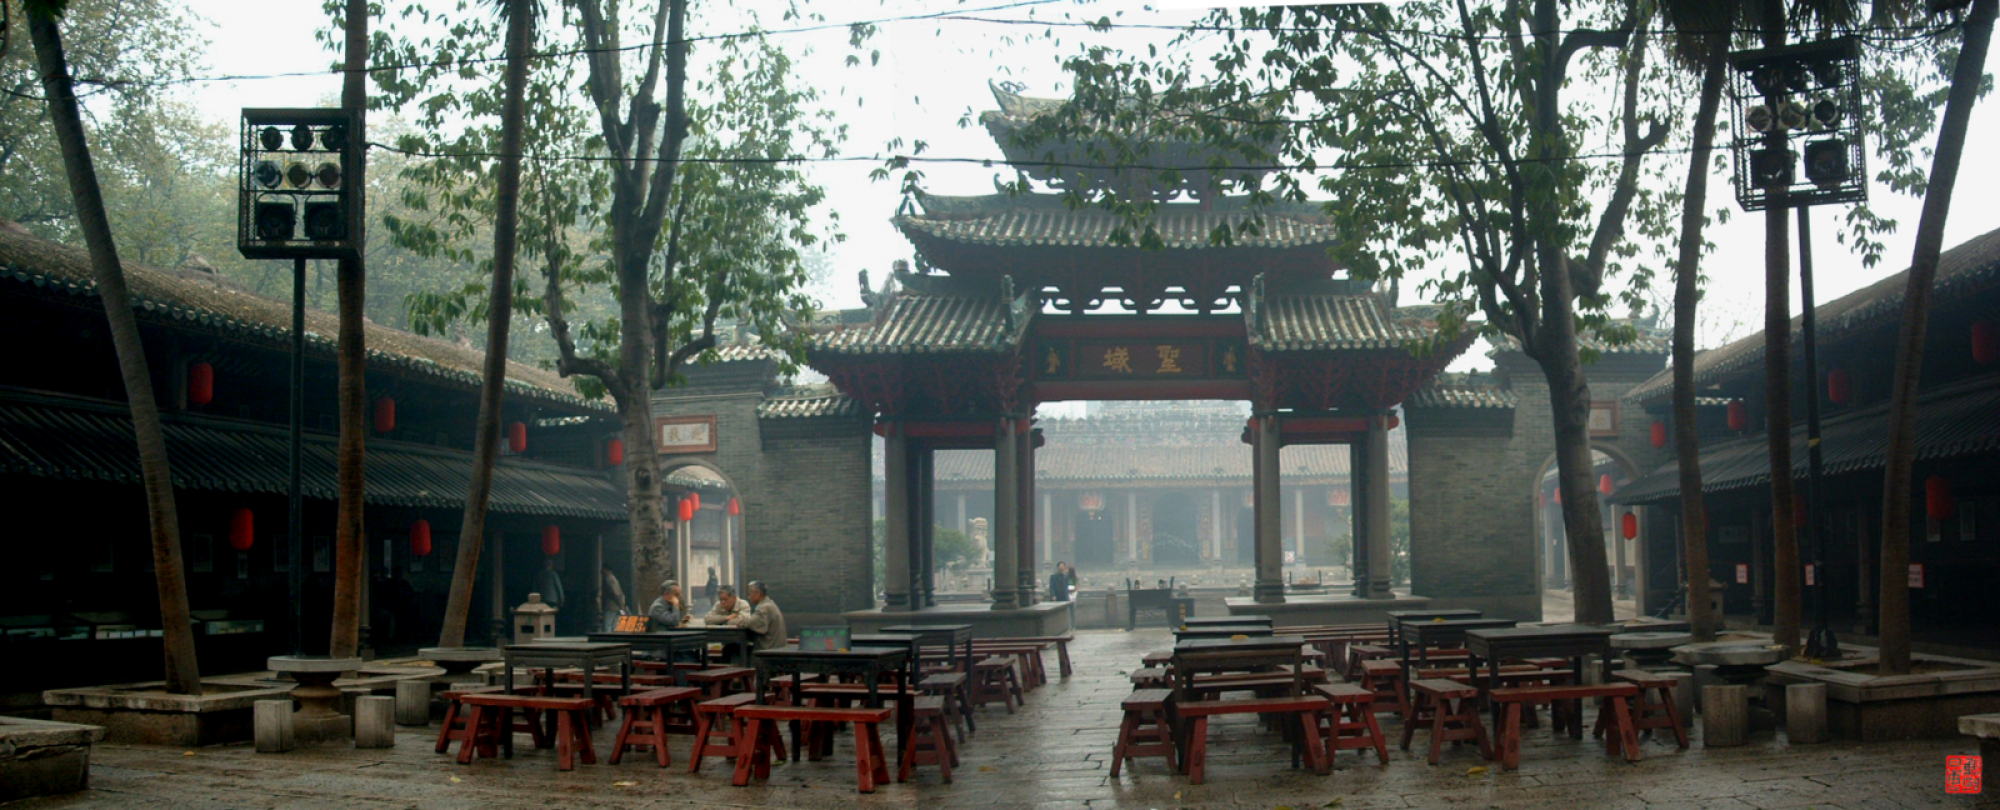 Chine Temple Foshan 2